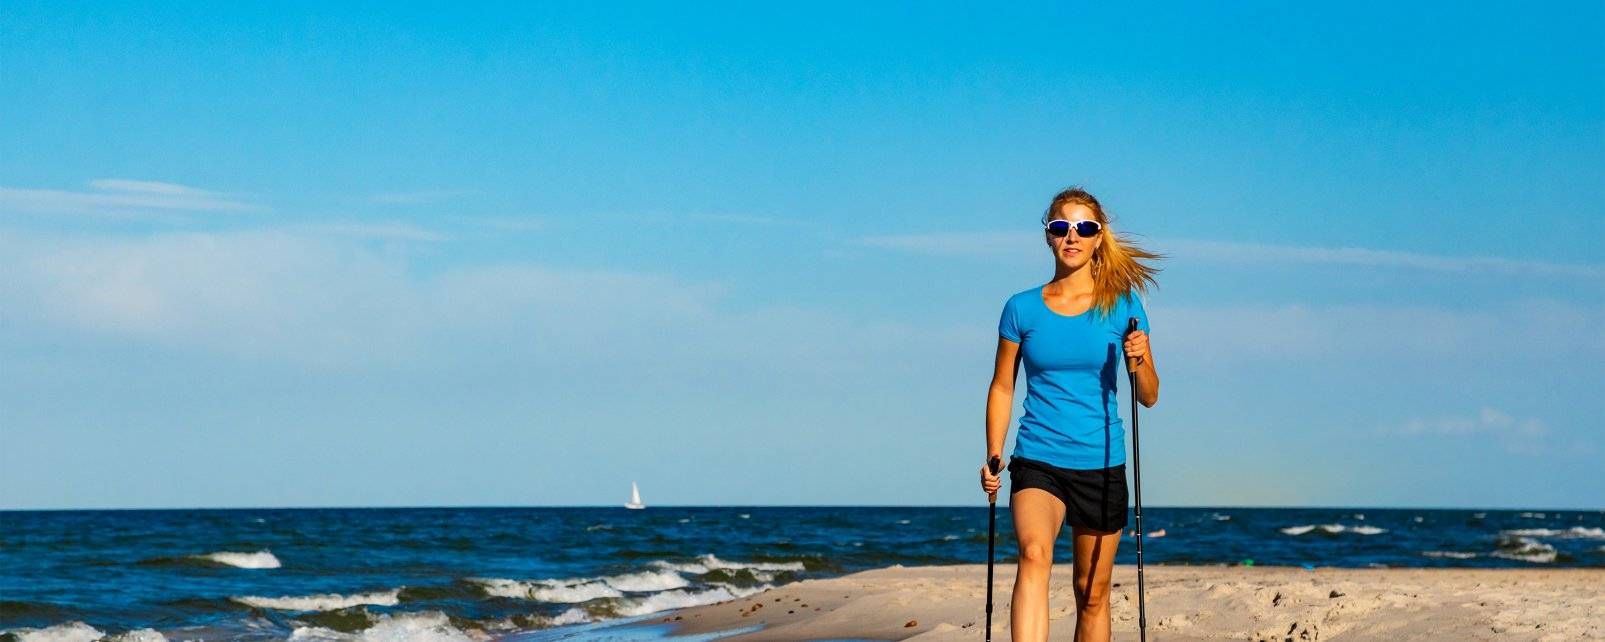 Nordic walking, Nordic walking in Lloret del Mar, Activities and leisure, Lloret de Mar, Catalonia